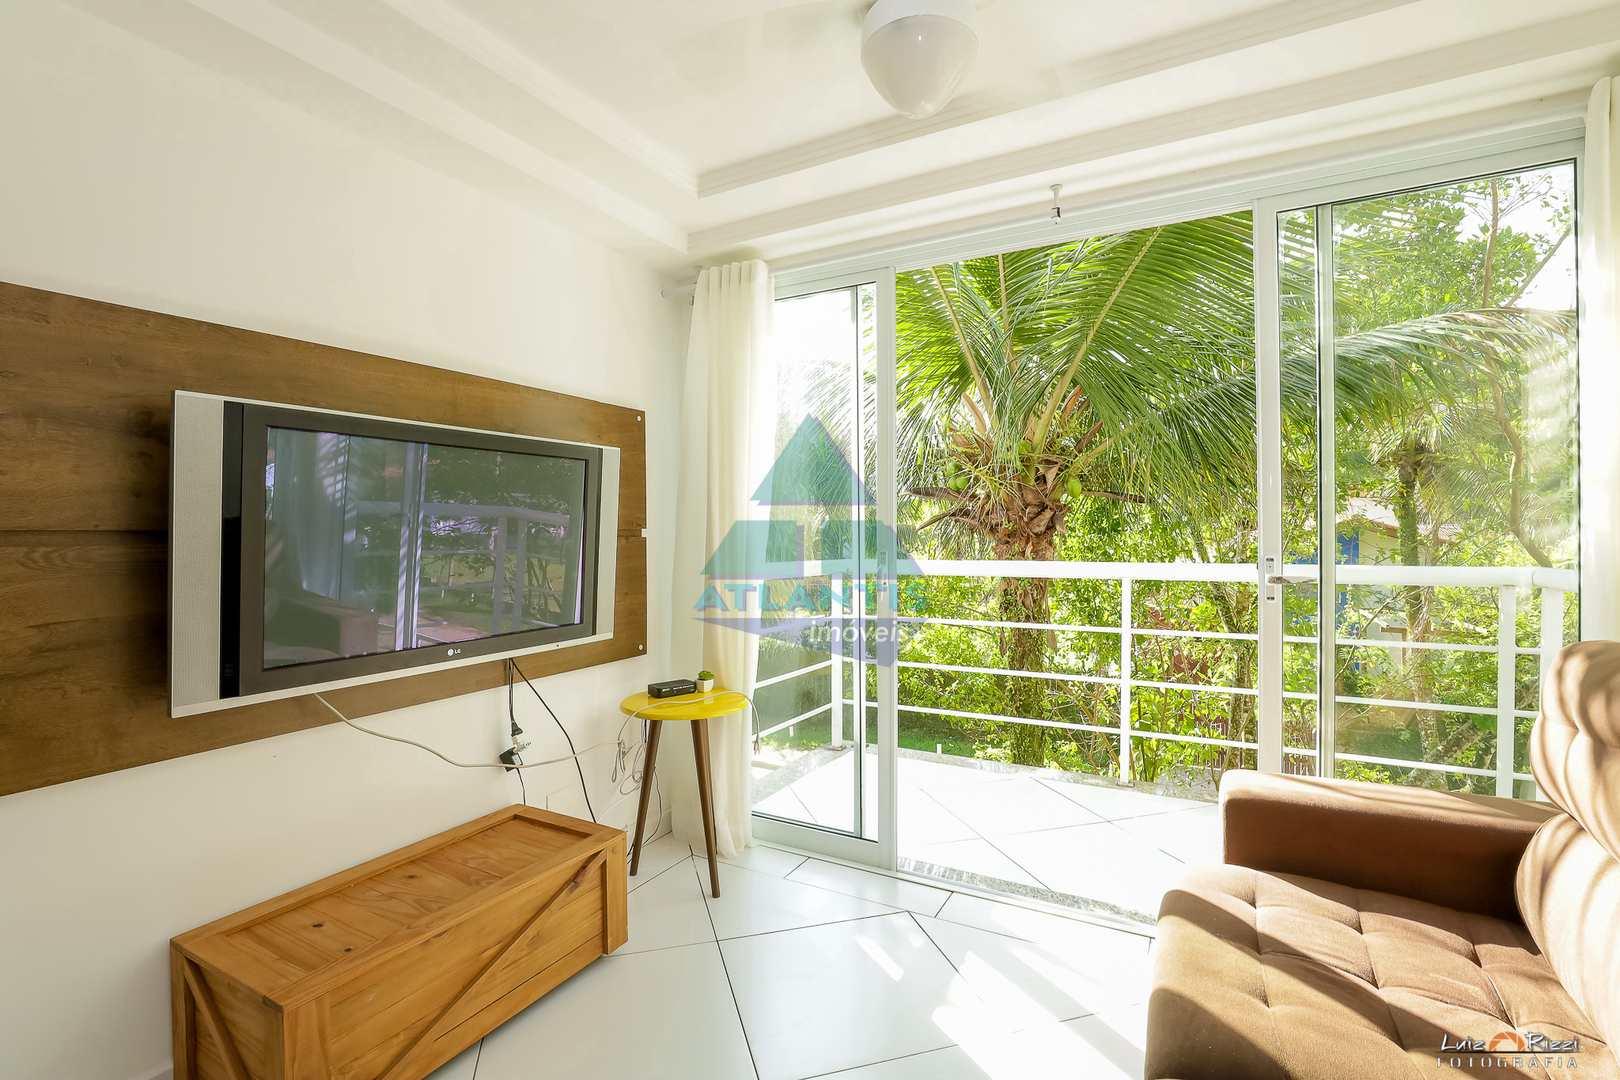 Casa com 4 dorms, Praia da Sununga, Ubatuba - R$ 1.1 mi, Cod: 1386